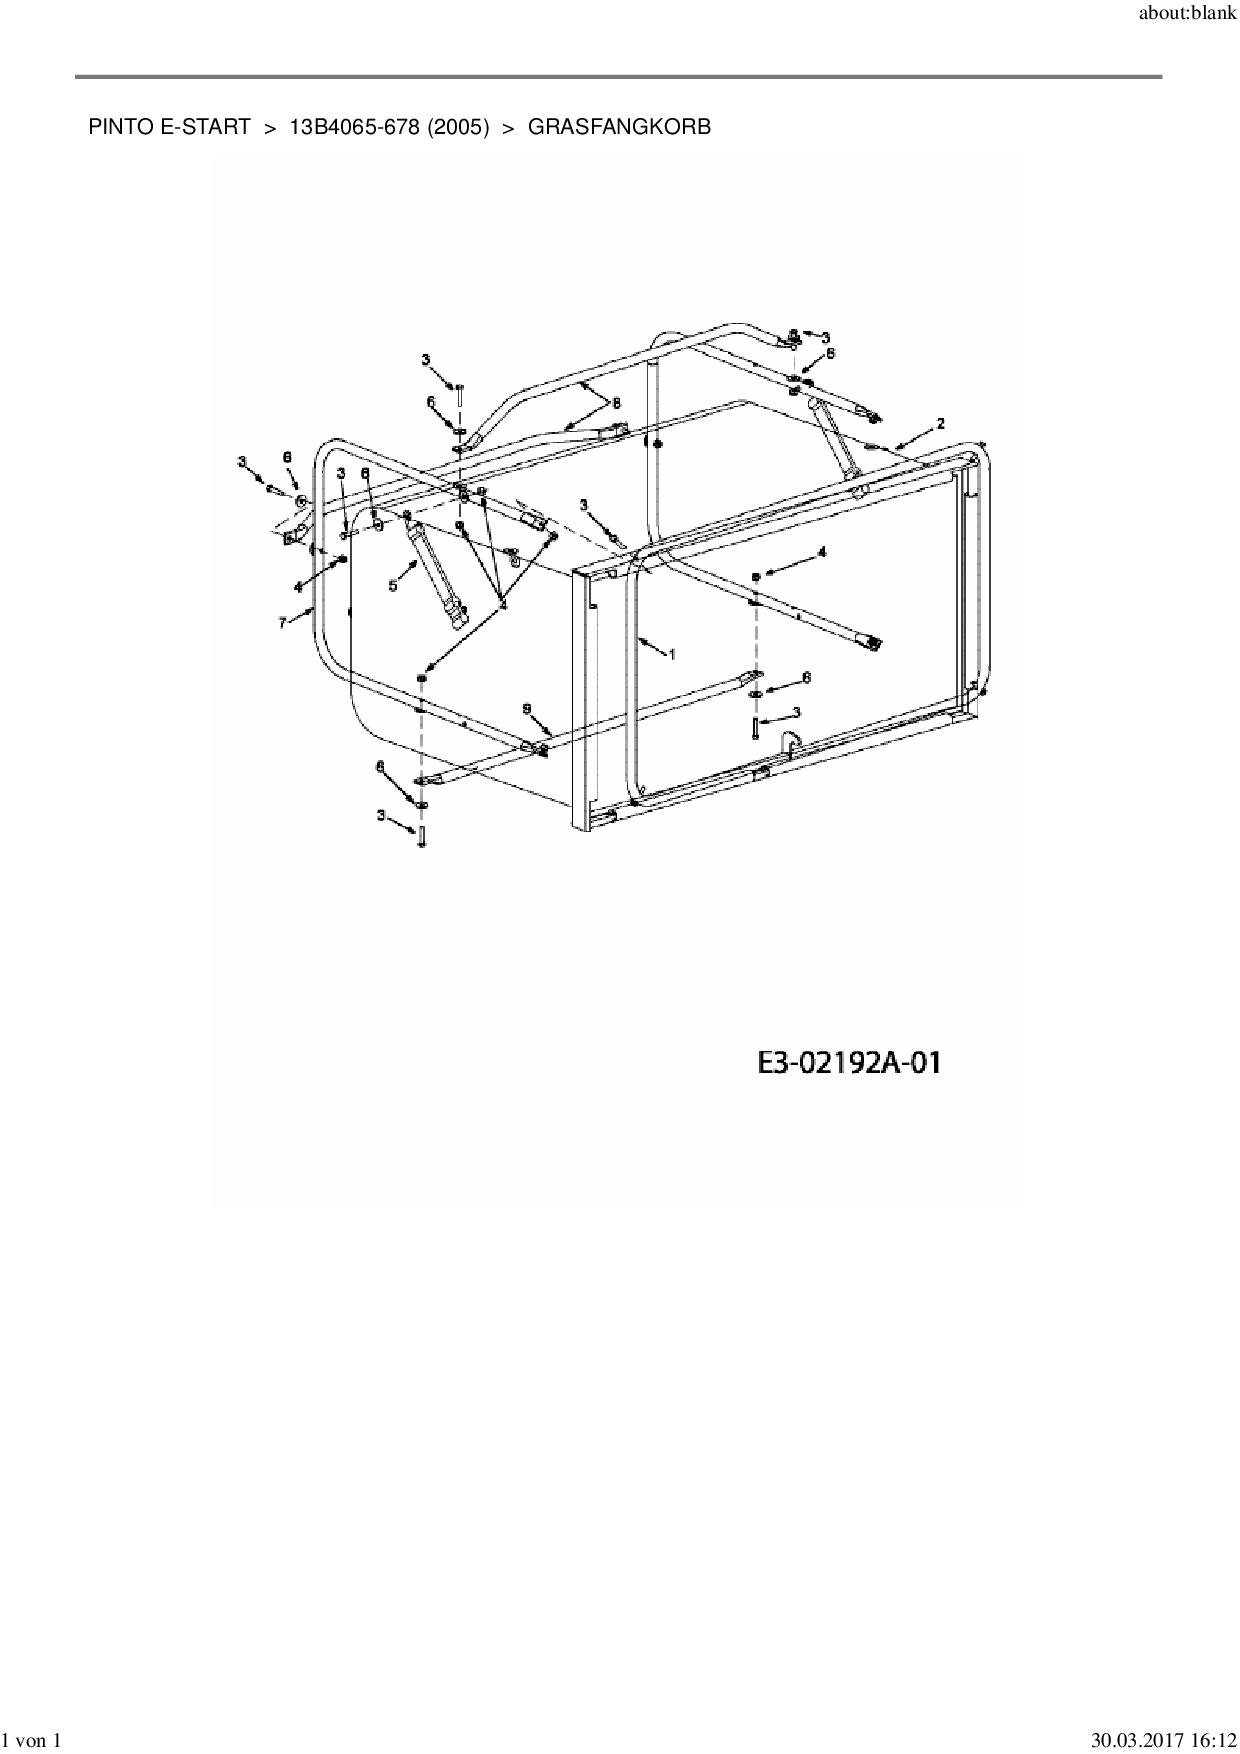 Haltegurt passend MTD Pinto E-Start 13B4065-678 Rasentraktor